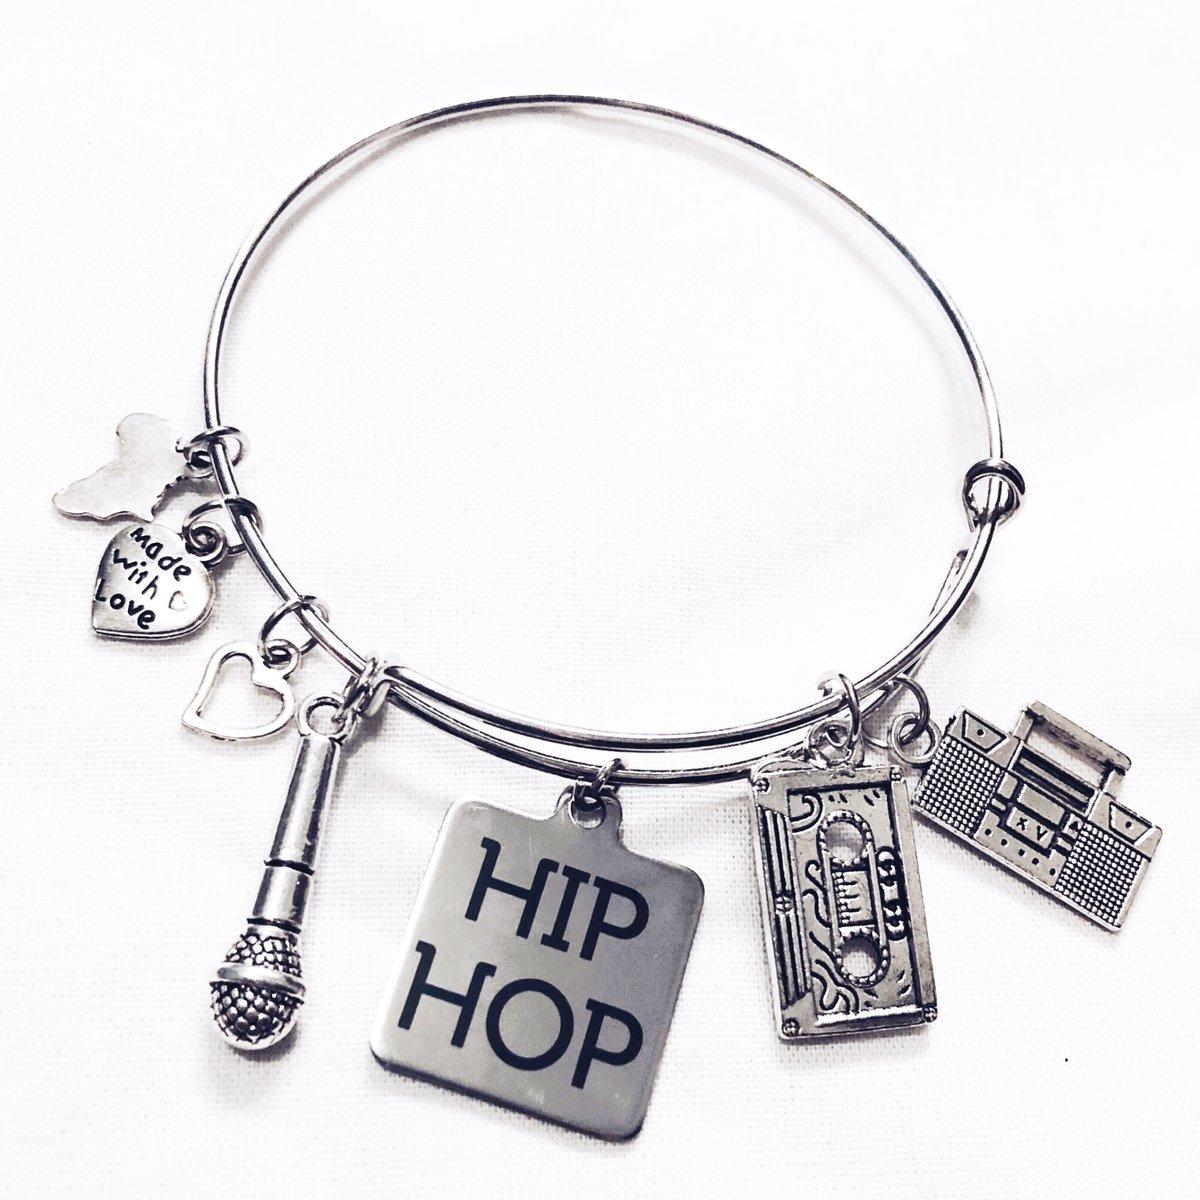 Image of Hip Hop Bangle